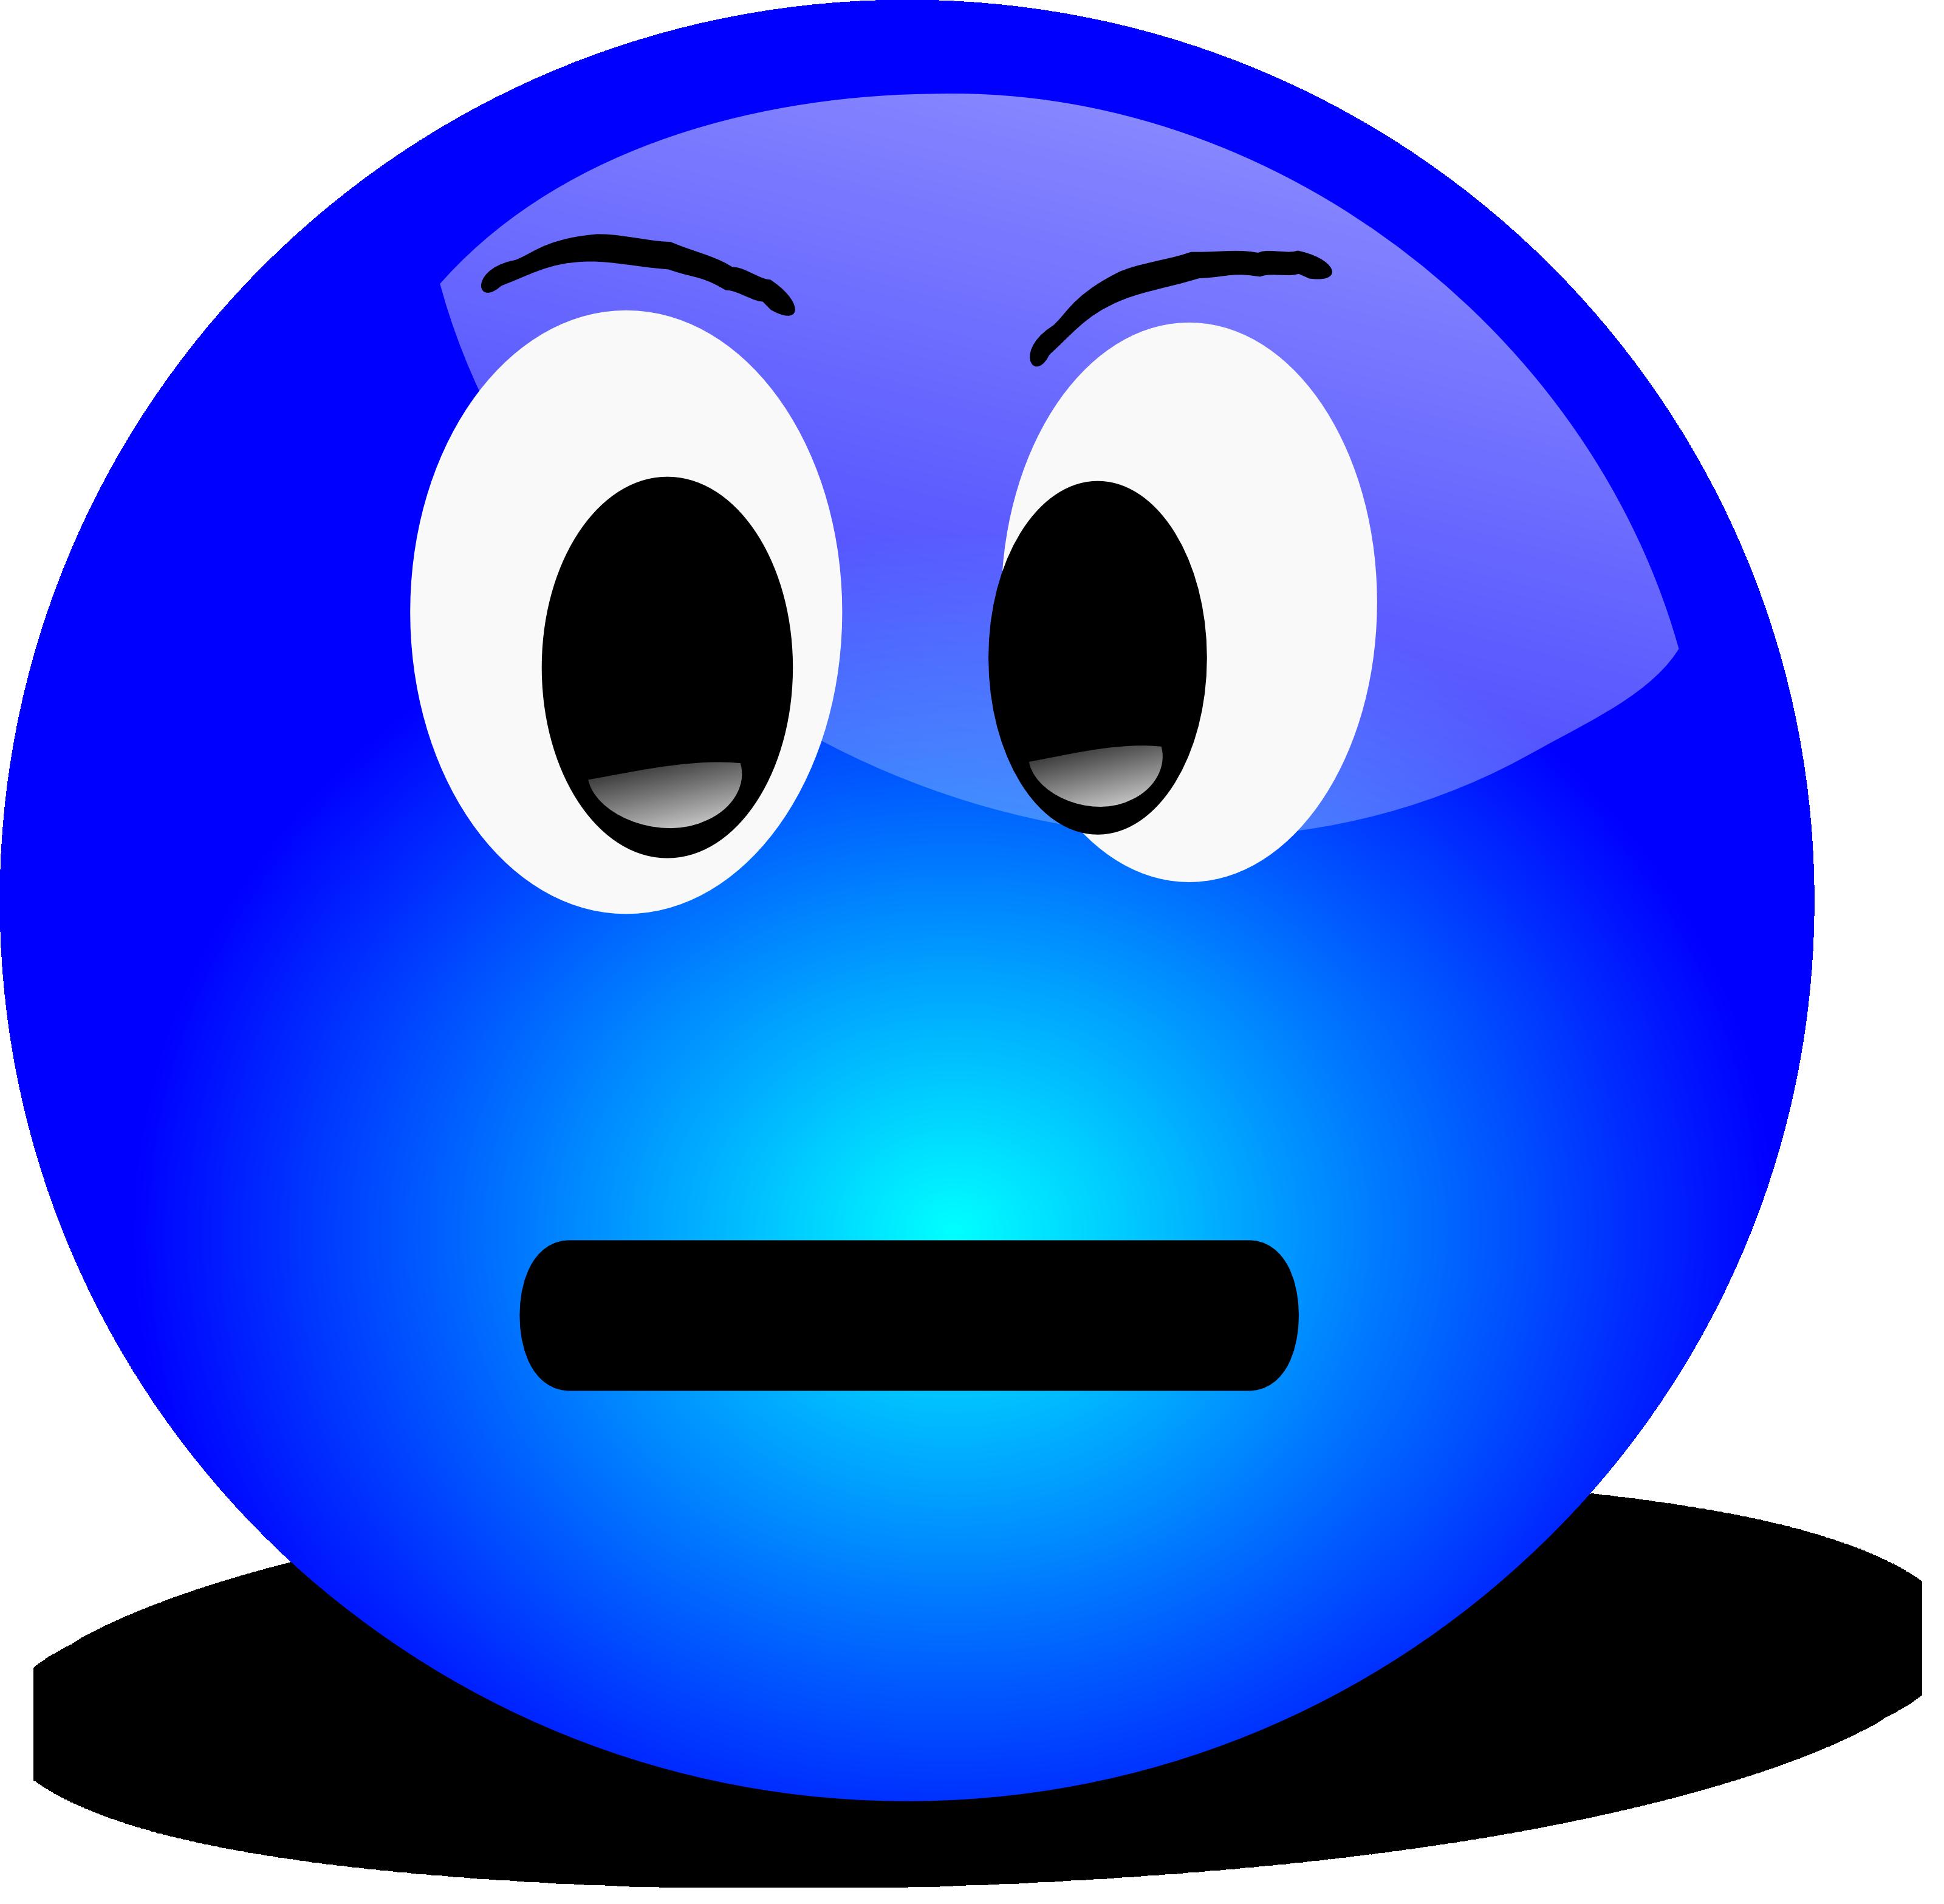 Grumpy Face Cliparts #2634860 - PNG Grumpy Face